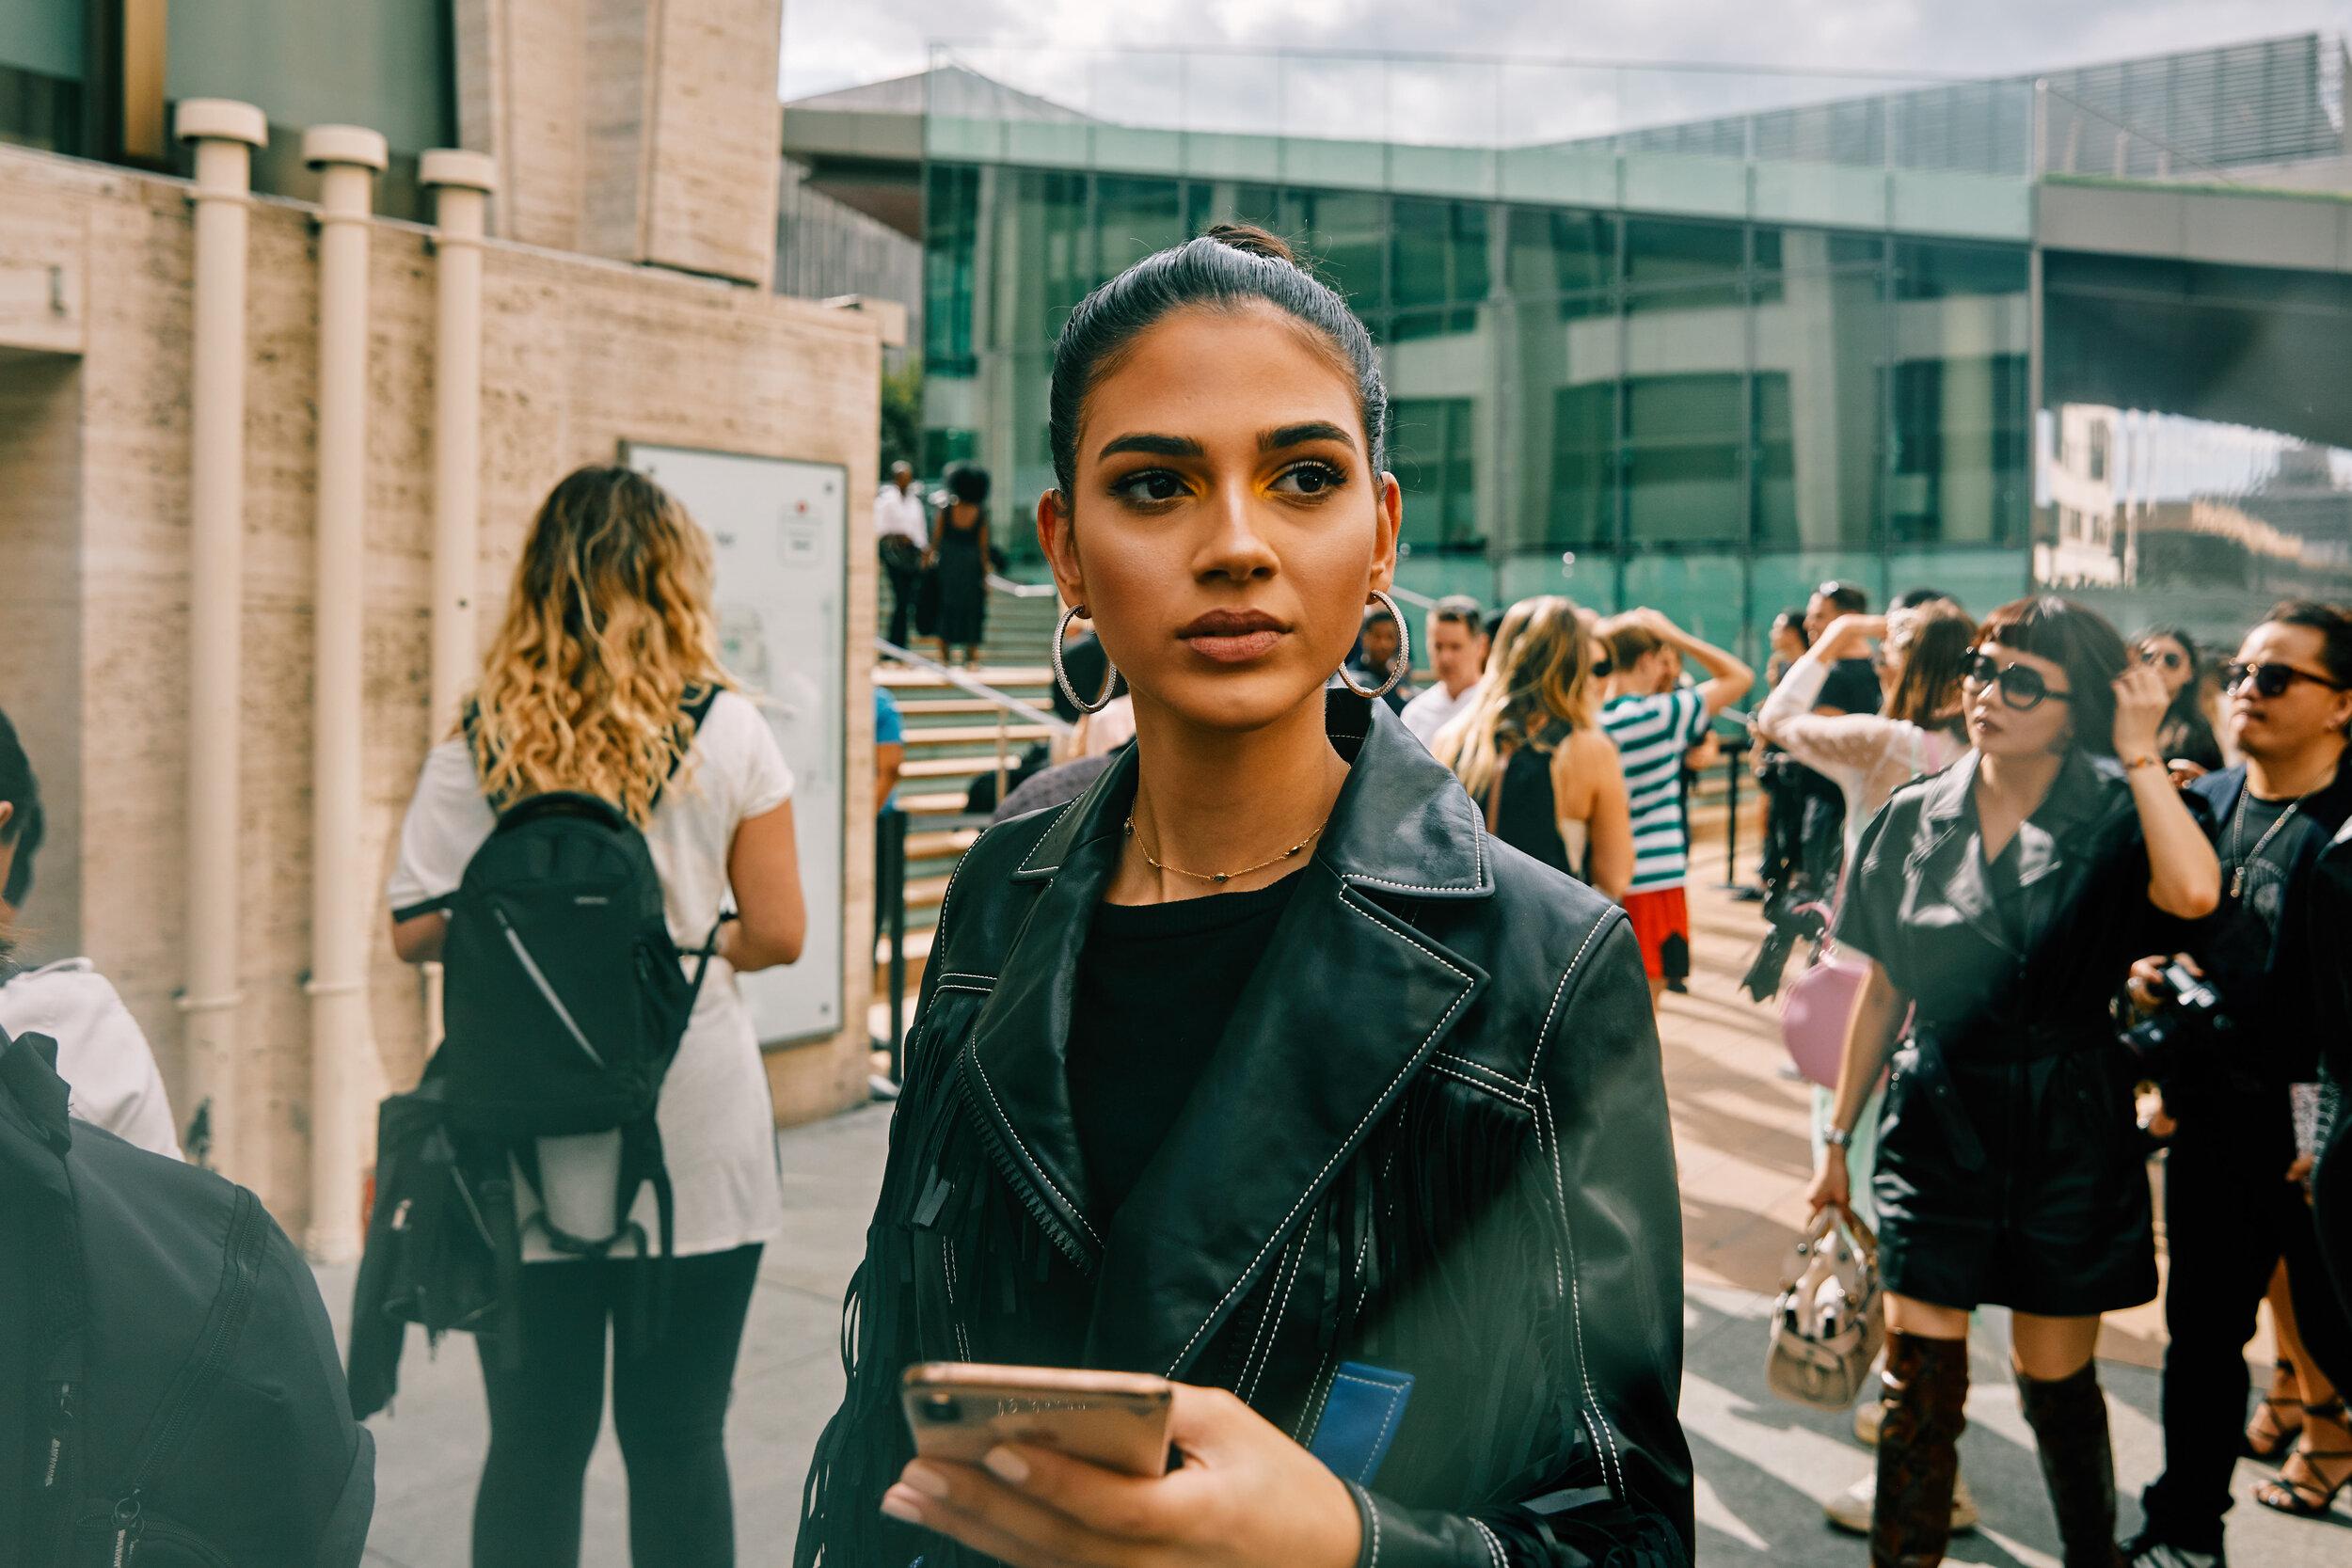 • Longchamp @ NYFW SEPT 2019 • Photographed x Denis Gutiérrez-Ogrinc •